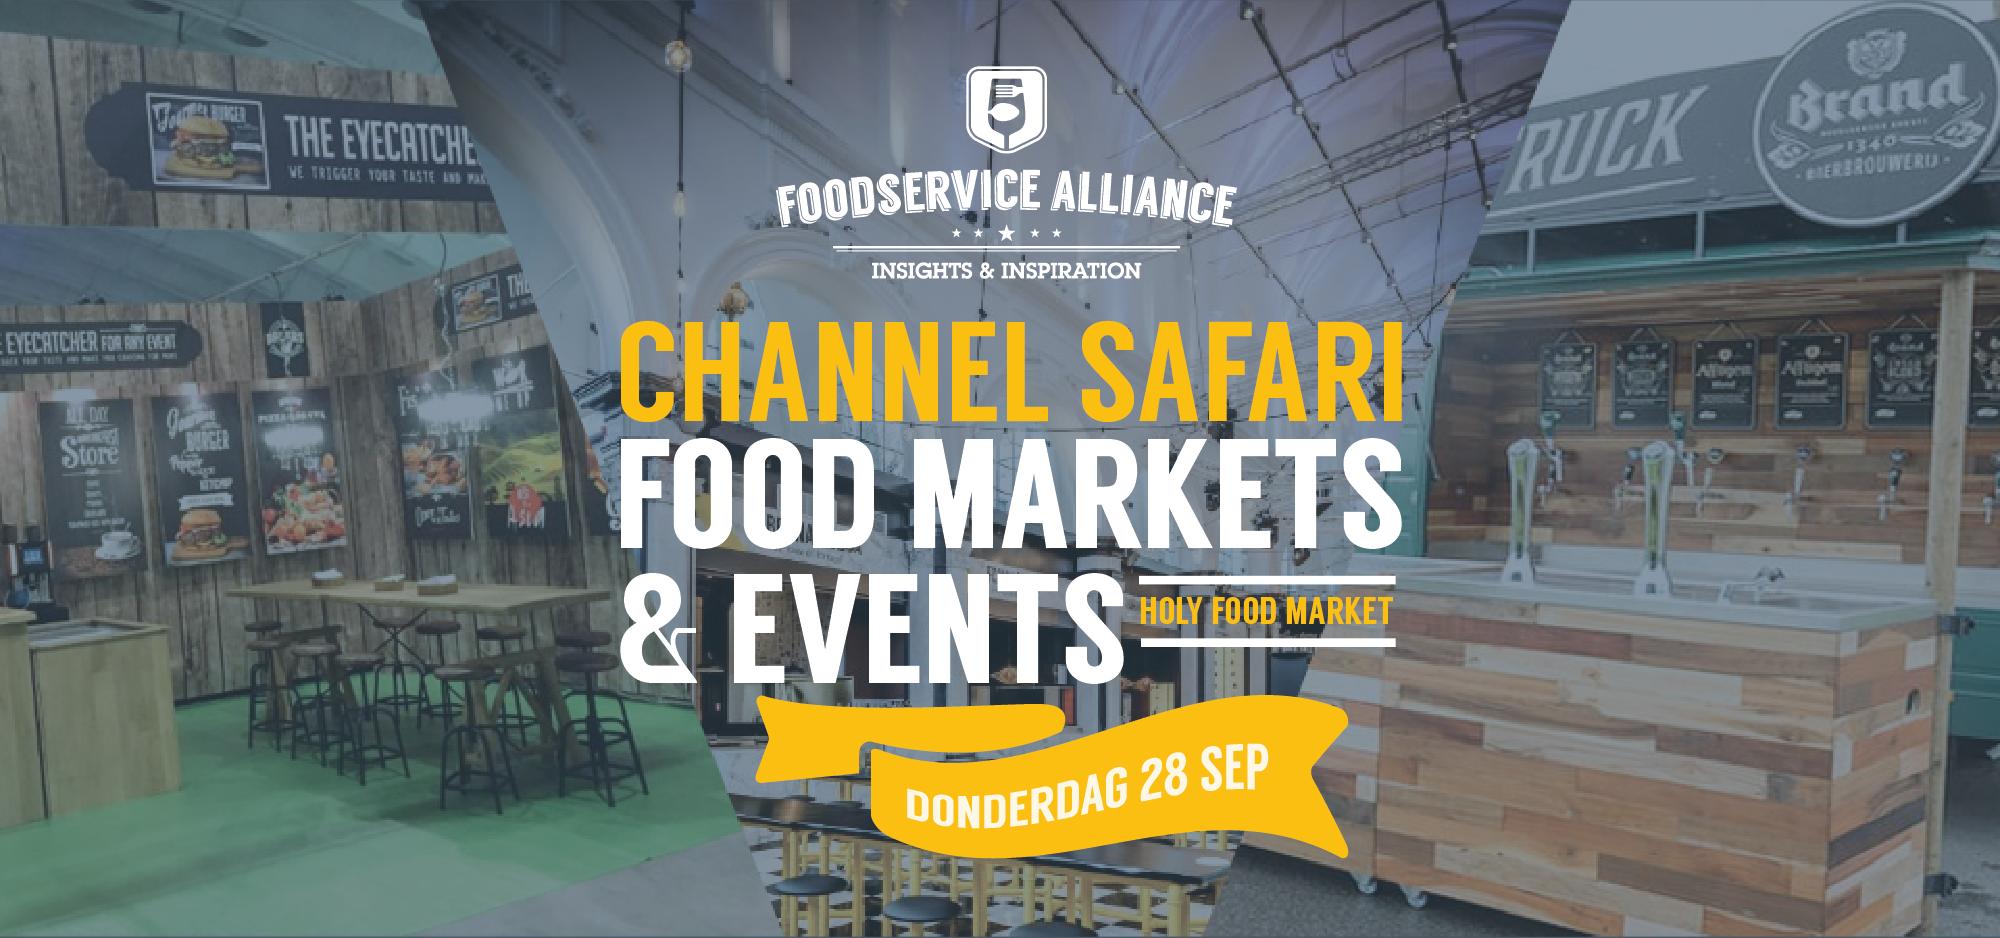 Channel Safari FOOD MARKETS & EVENTS